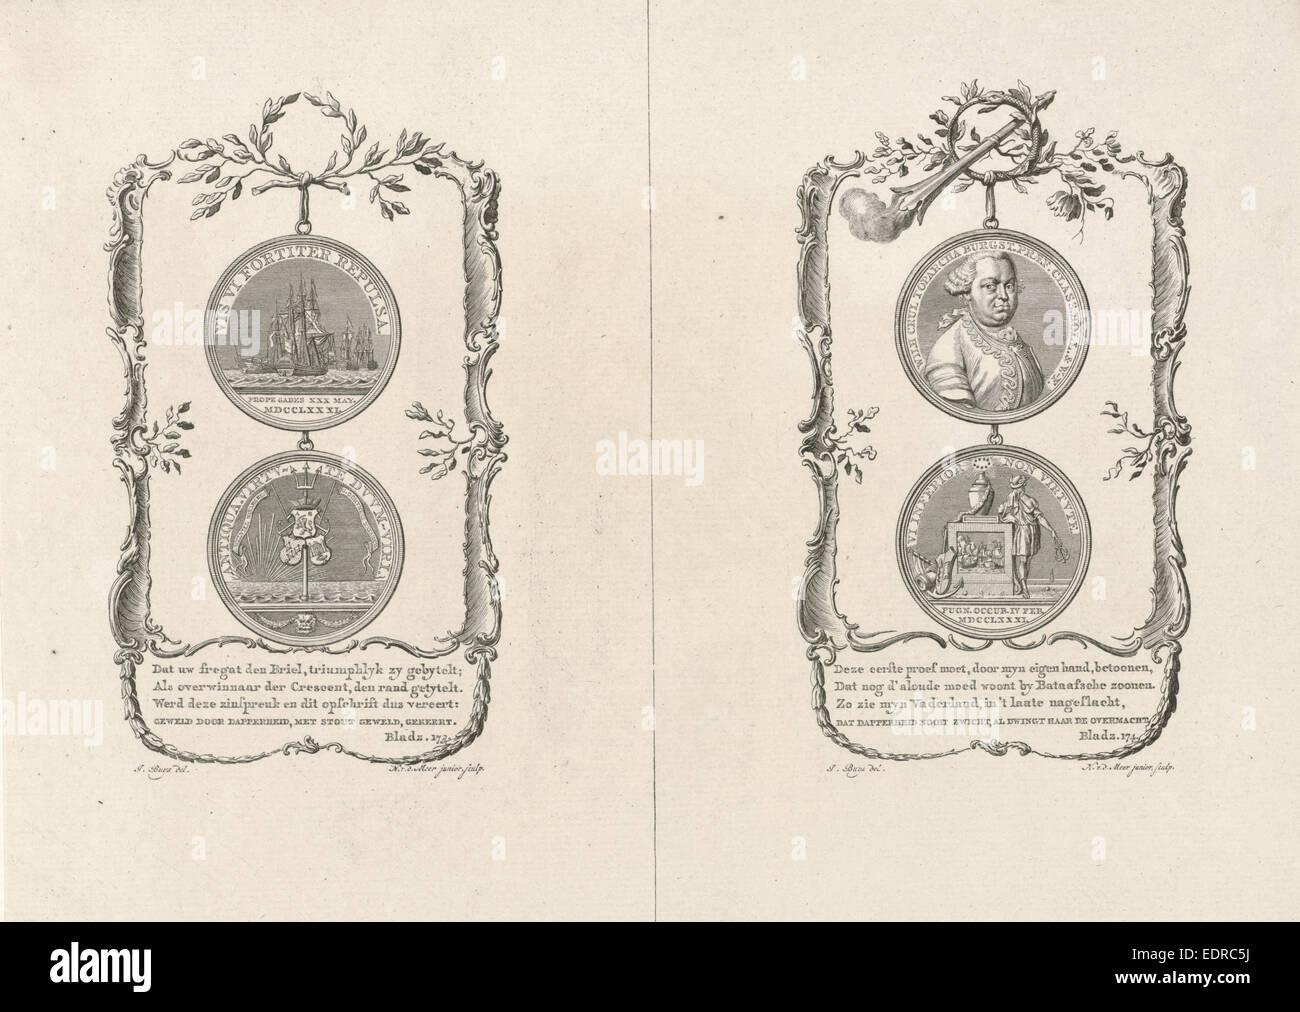 Commemorative medals for the Battle of Cadiz and for Willem Crul, Noach van der Meer (II), 1781 - Stock Image